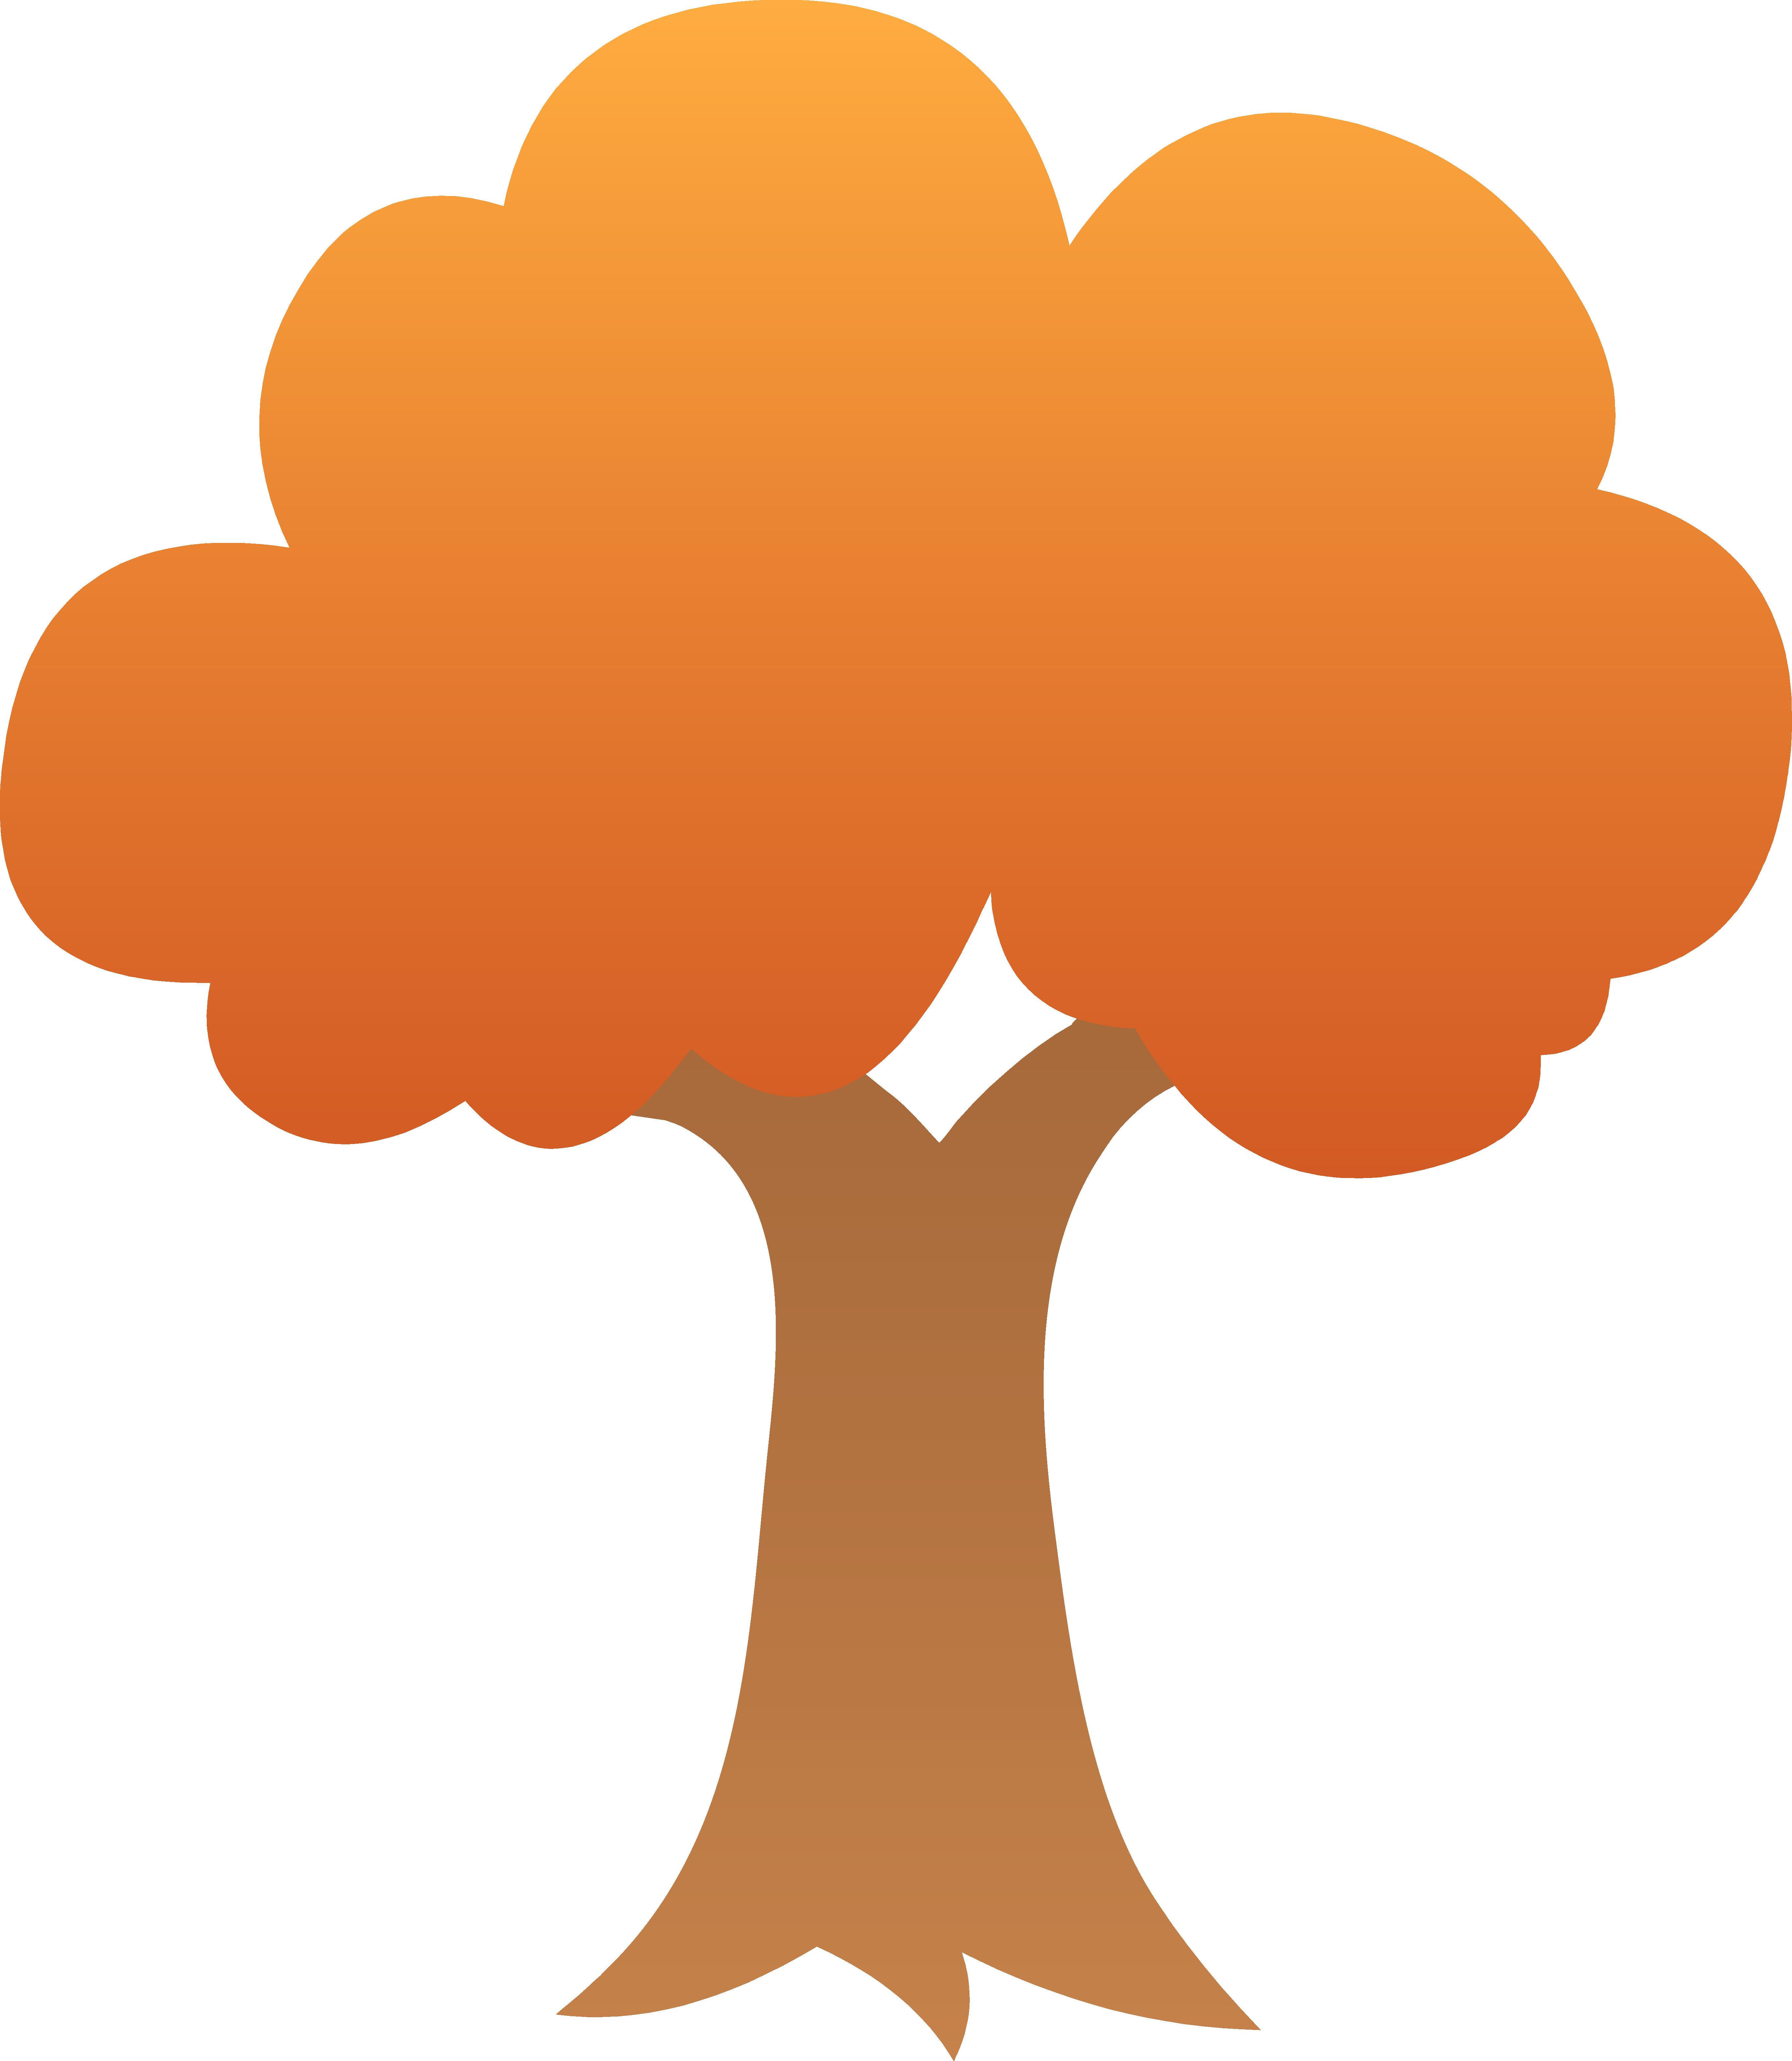 Fall Leaves Tree Clipart | Clipart Libra-Fall Leaves Tree Clipart | Clipart library - Free Clipart Images-11